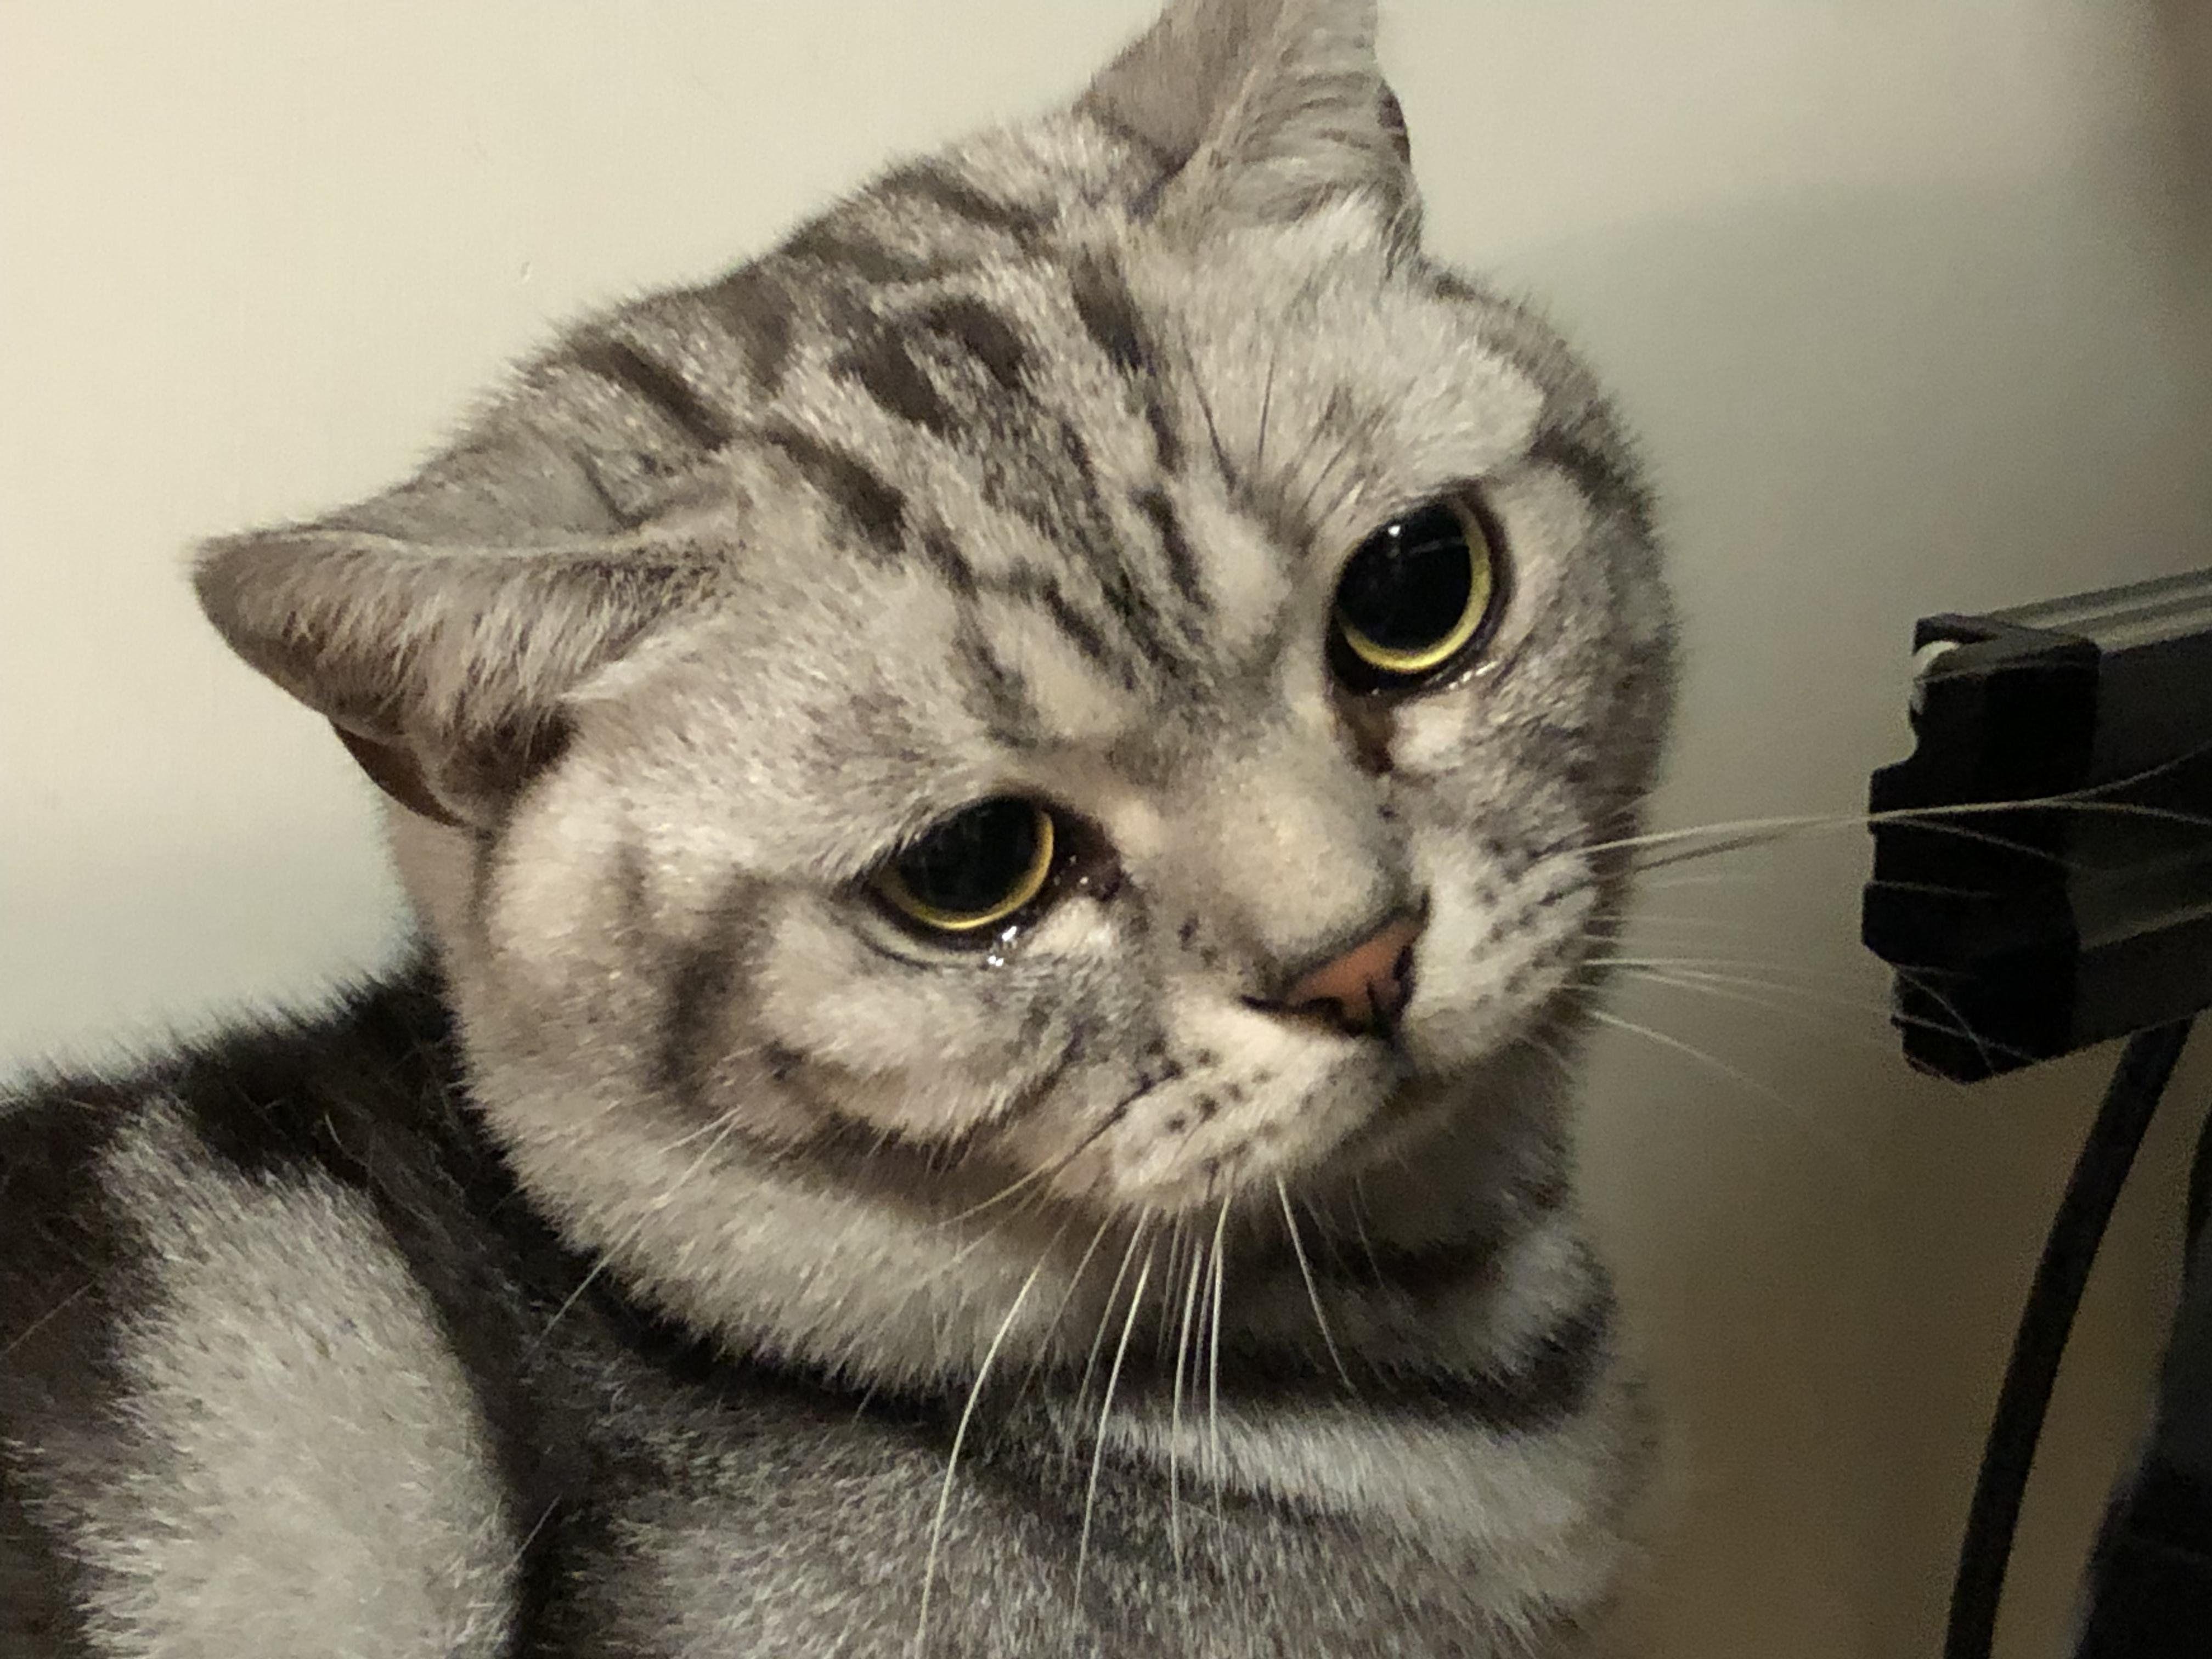 #Cats #Cat #Kittens #Kitten #Kitty #Pets #Pet #Meow